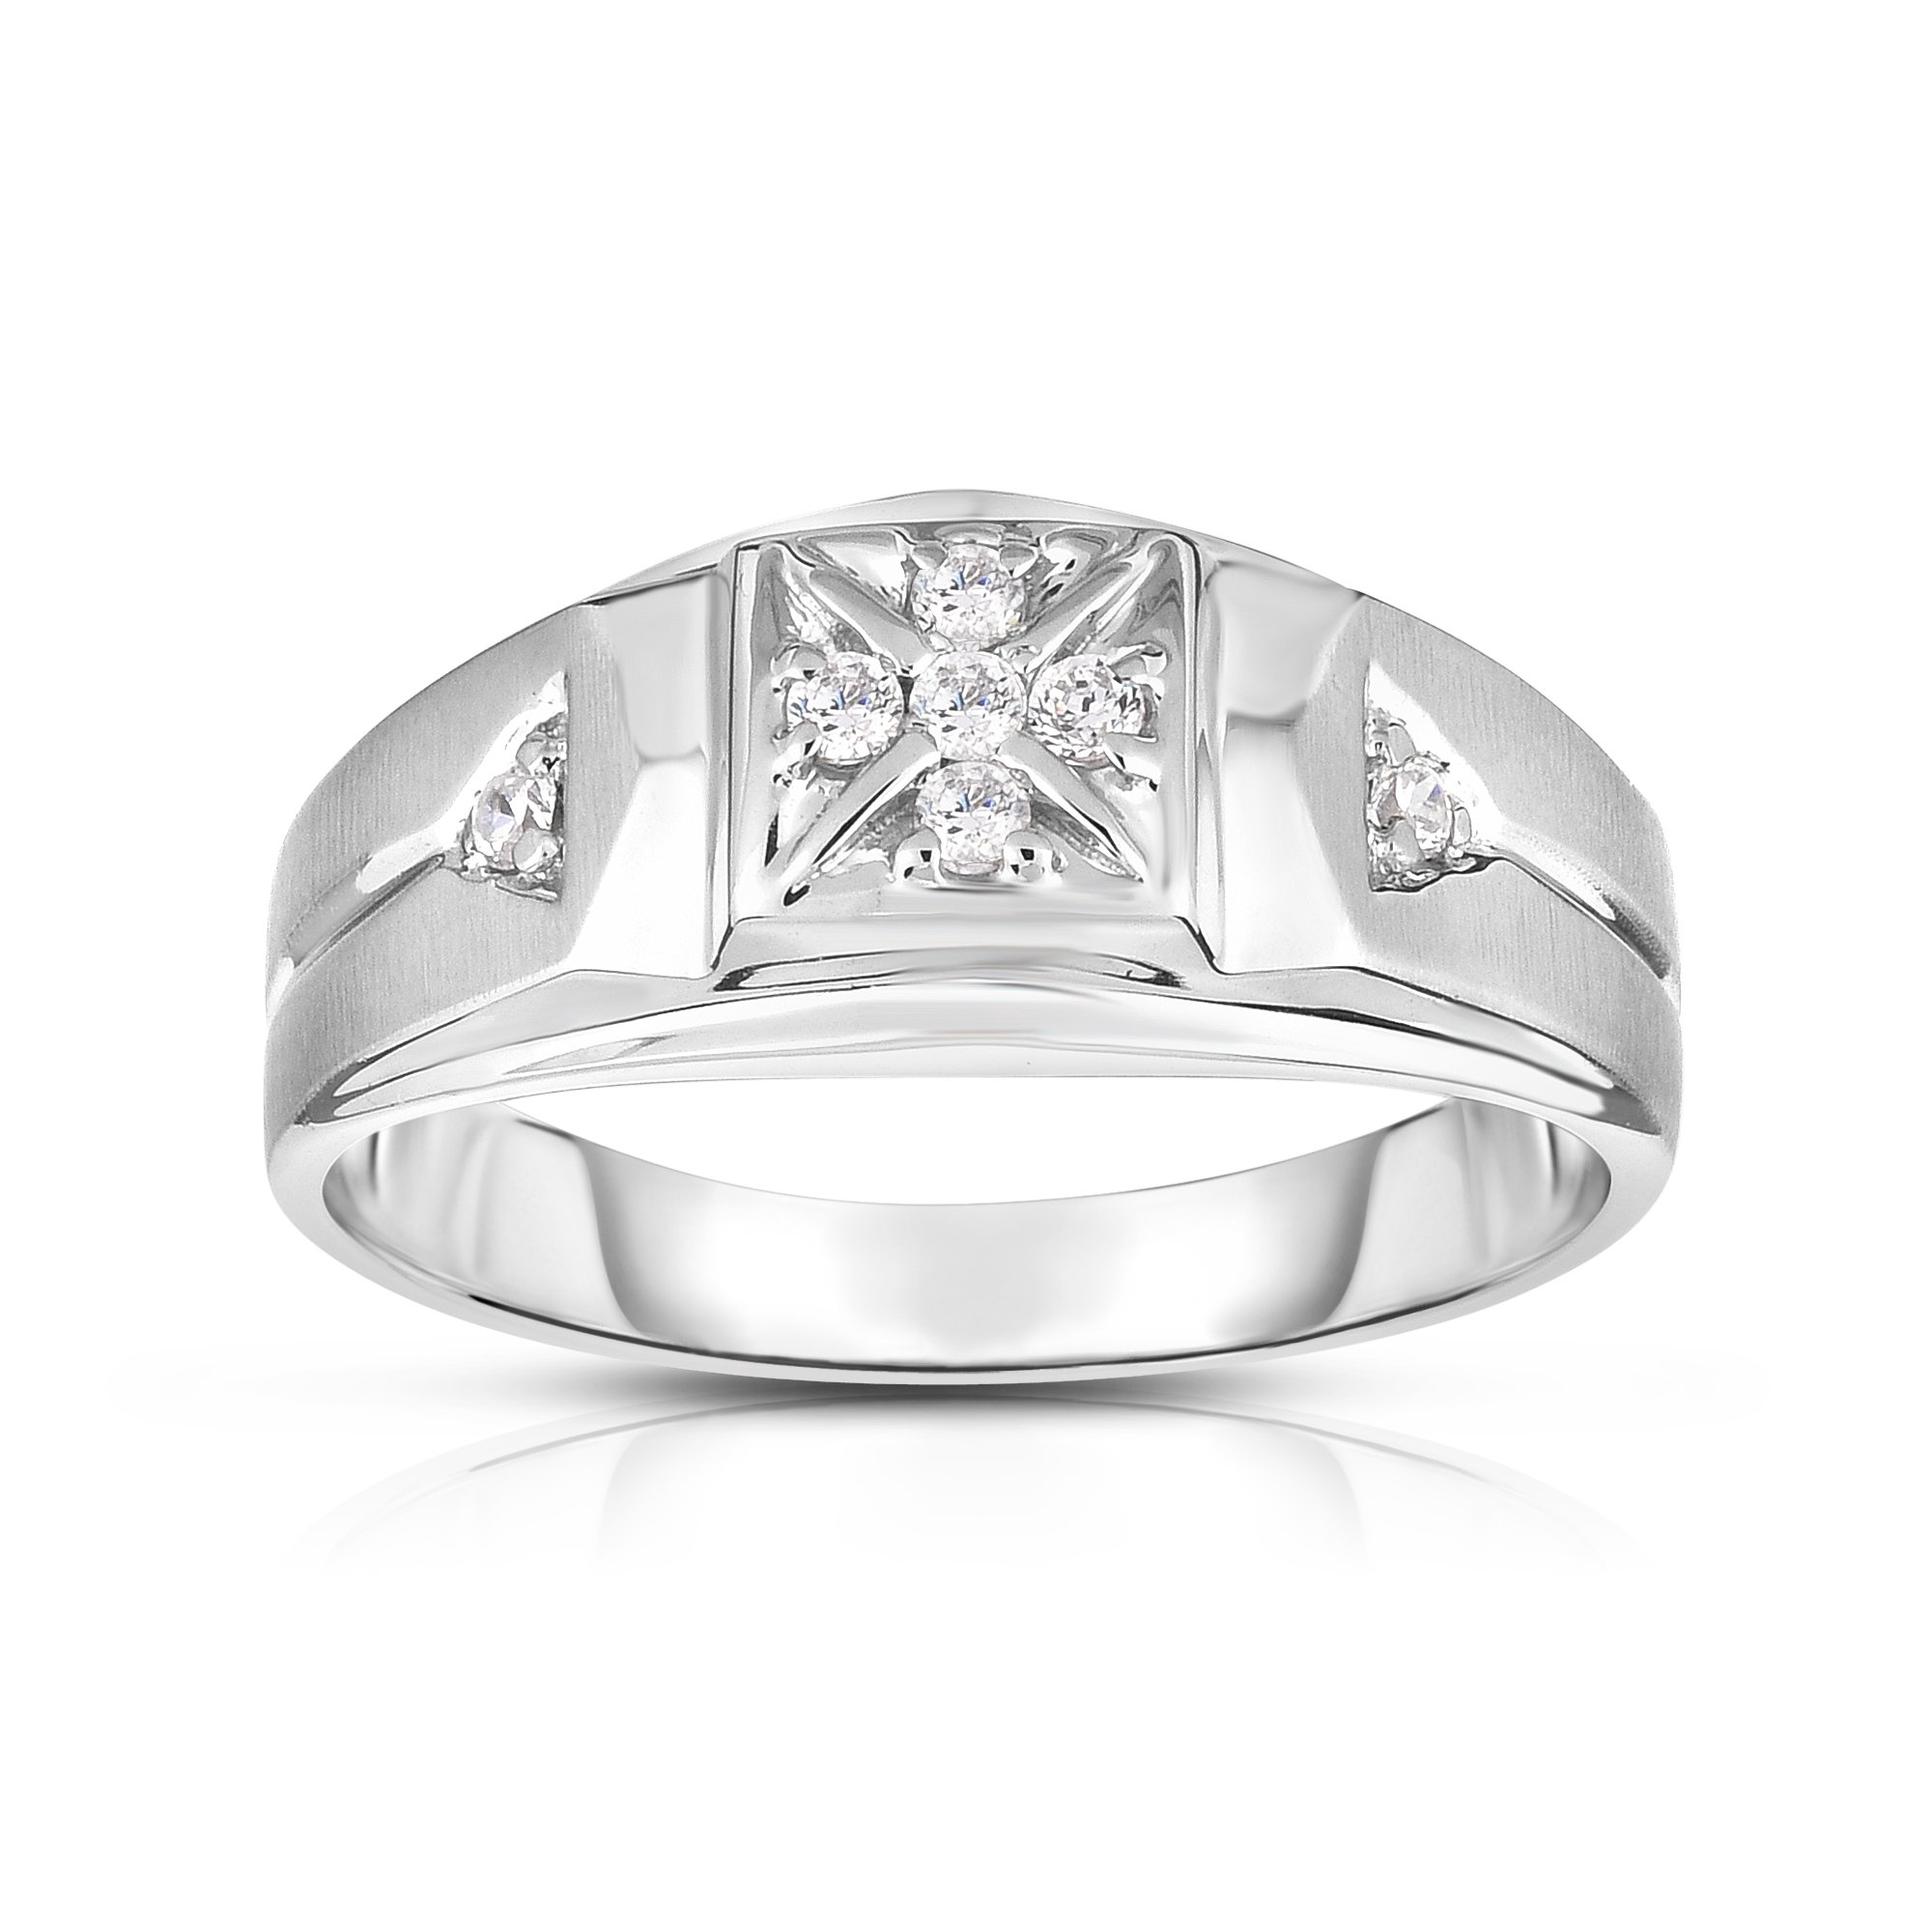 Noray Designs 14K White Gold Diamond (0.12 Ct, I1-I2 Clarity, G-H Color) Men's 7-Stone Ring